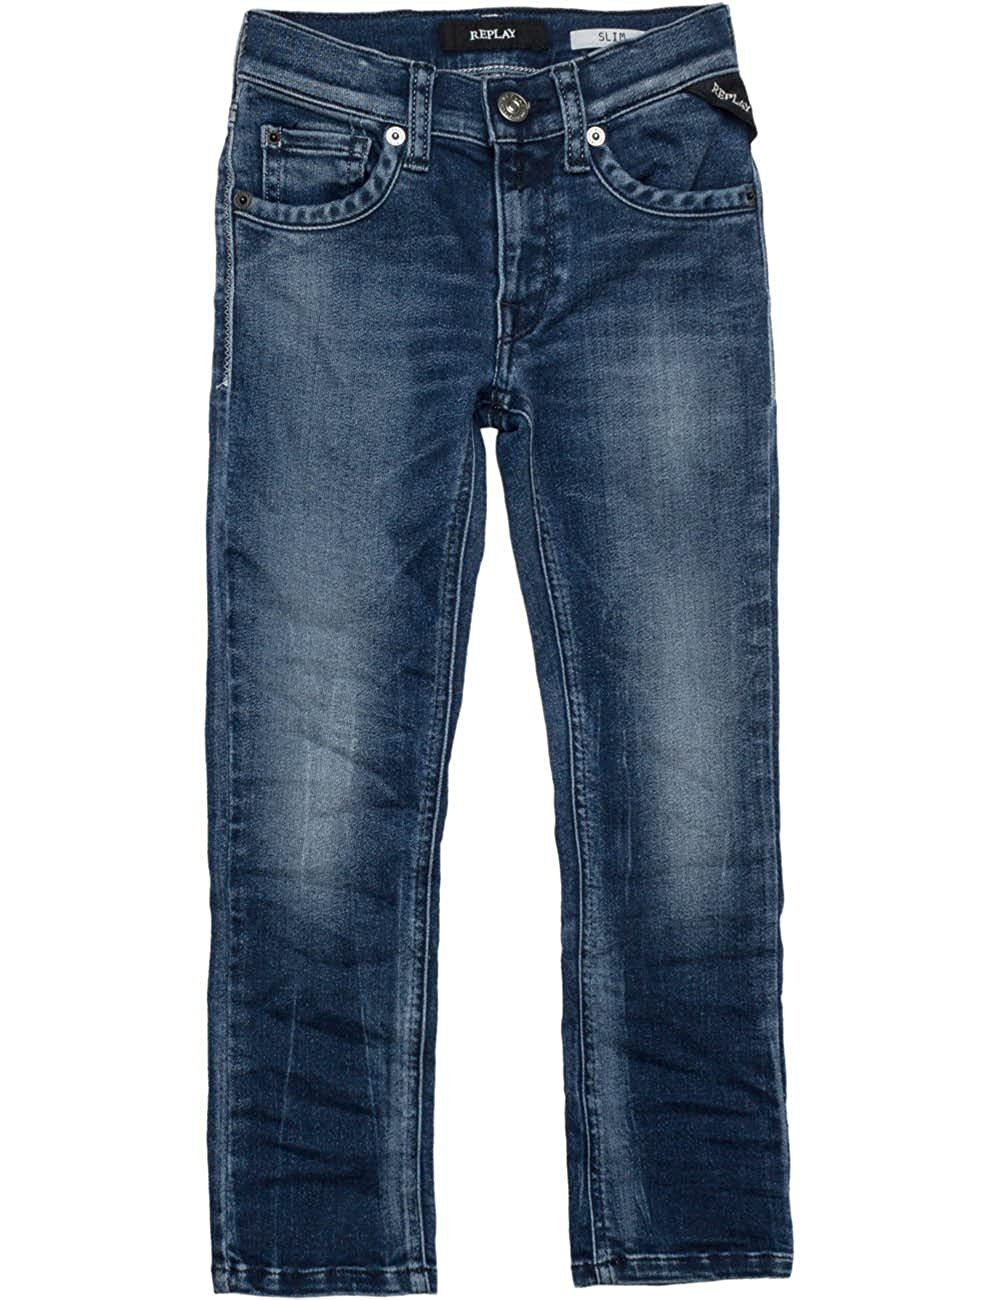 Replay Boy's Jeans Replay Boy' s Jeans SB9011.097.23D 450